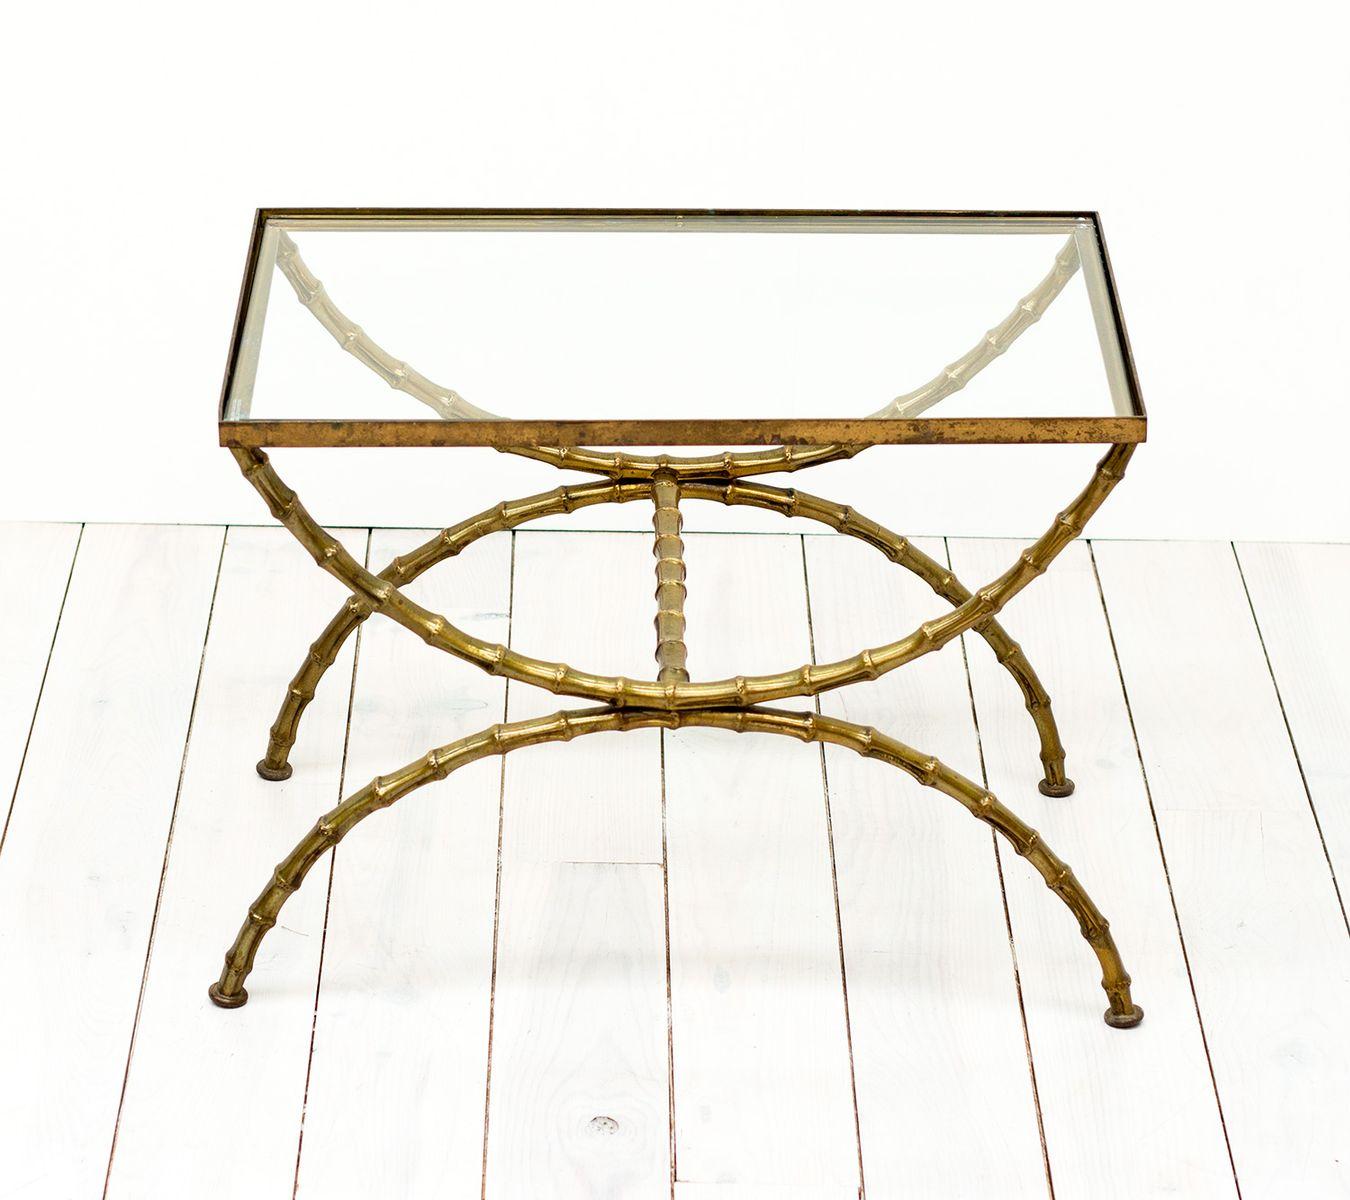 vintage messing glas beistelltisch in bambus optik. Black Bedroom Furniture Sets. Home Design Ideas